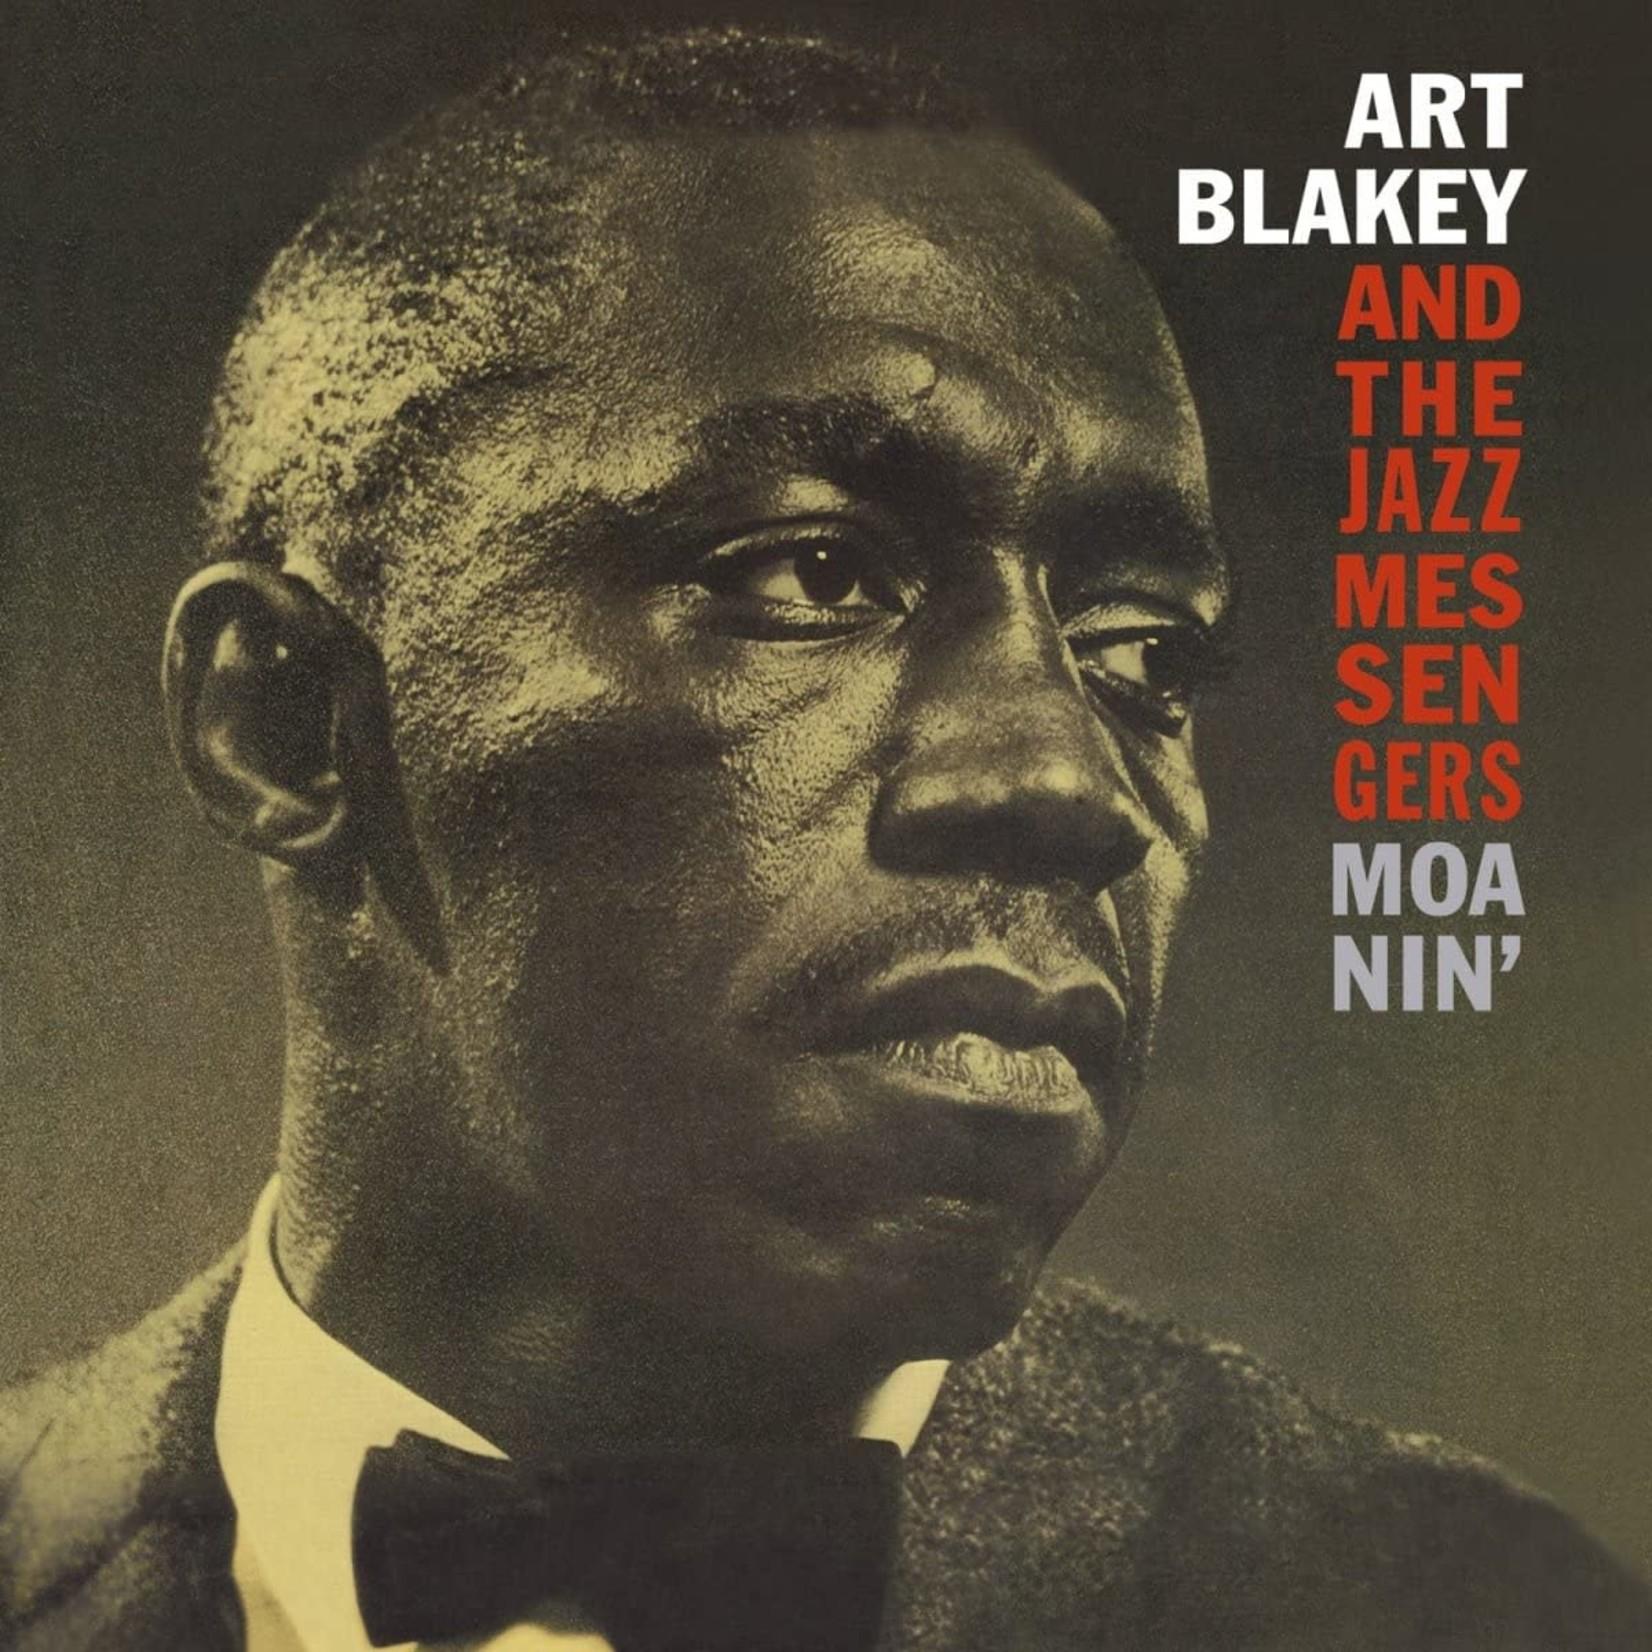 [New] Blakey, Art: Moanin' (Blue Note 75th Anniversary Series)